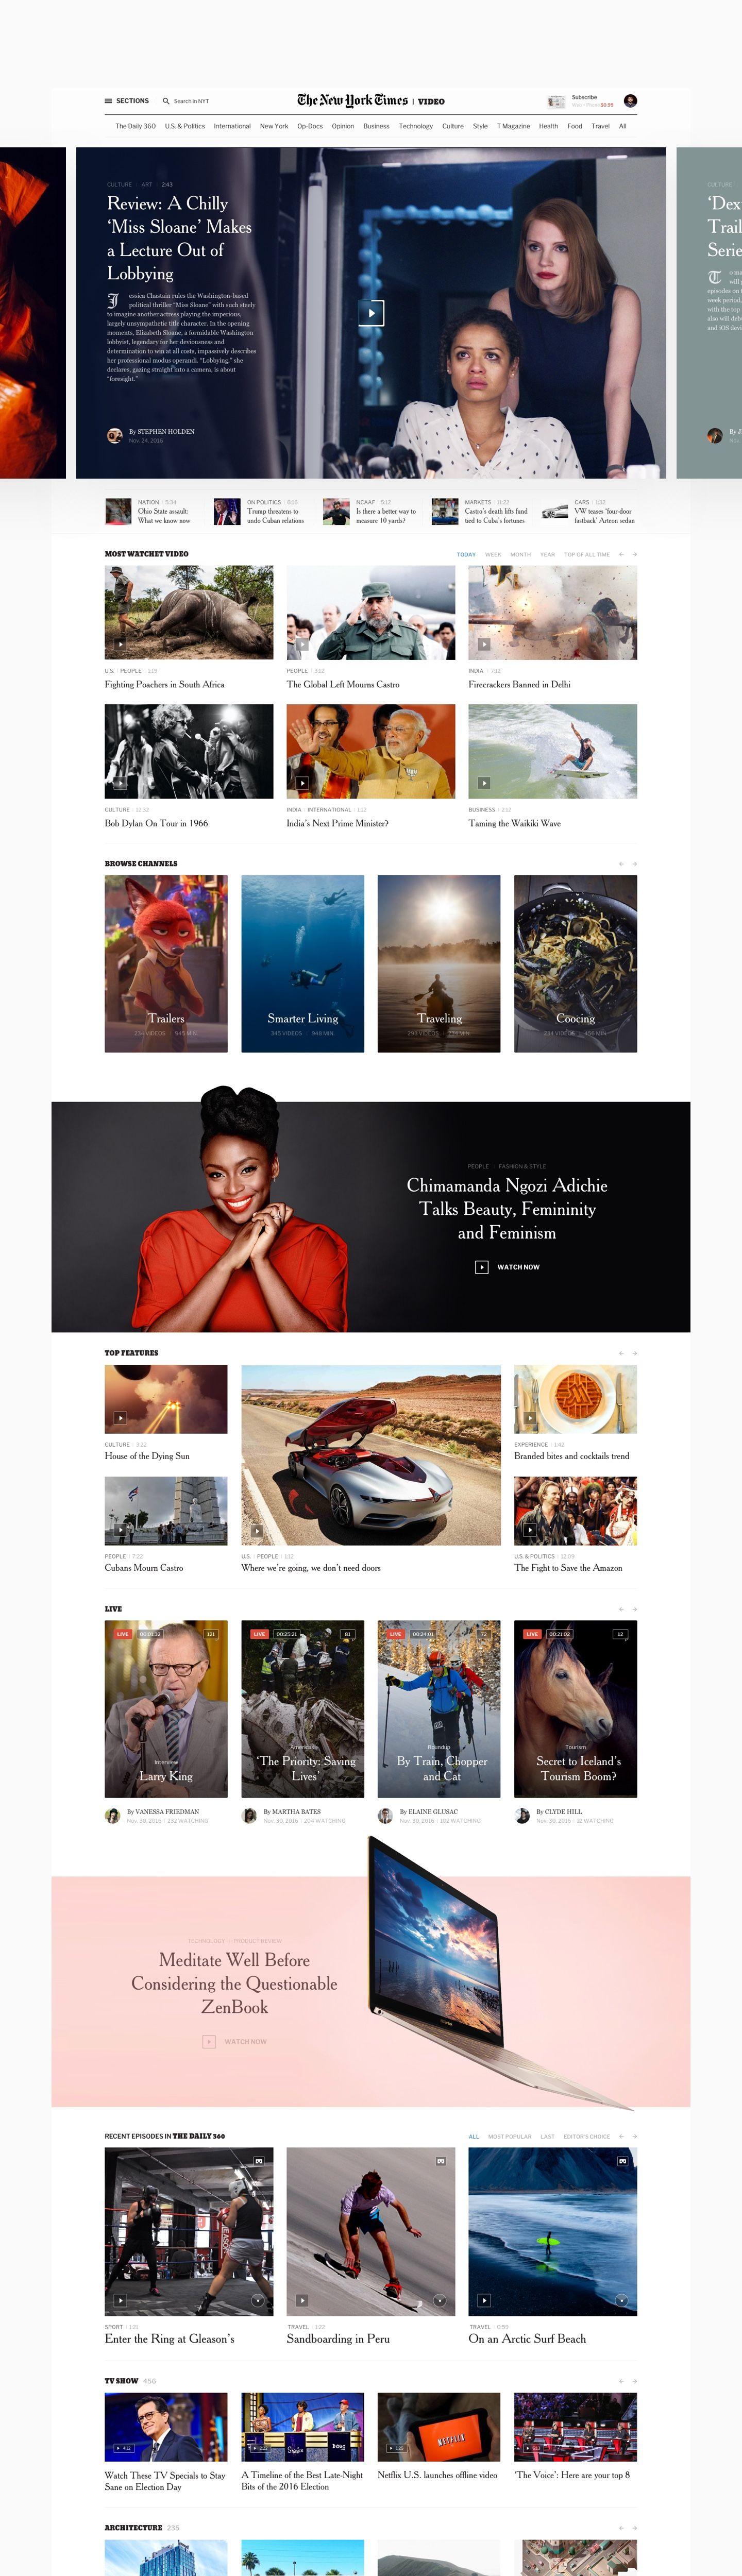 Editorial Design The New York Times Redesign Concept Web Design Inspiration Web Design Examples Fun Website Design